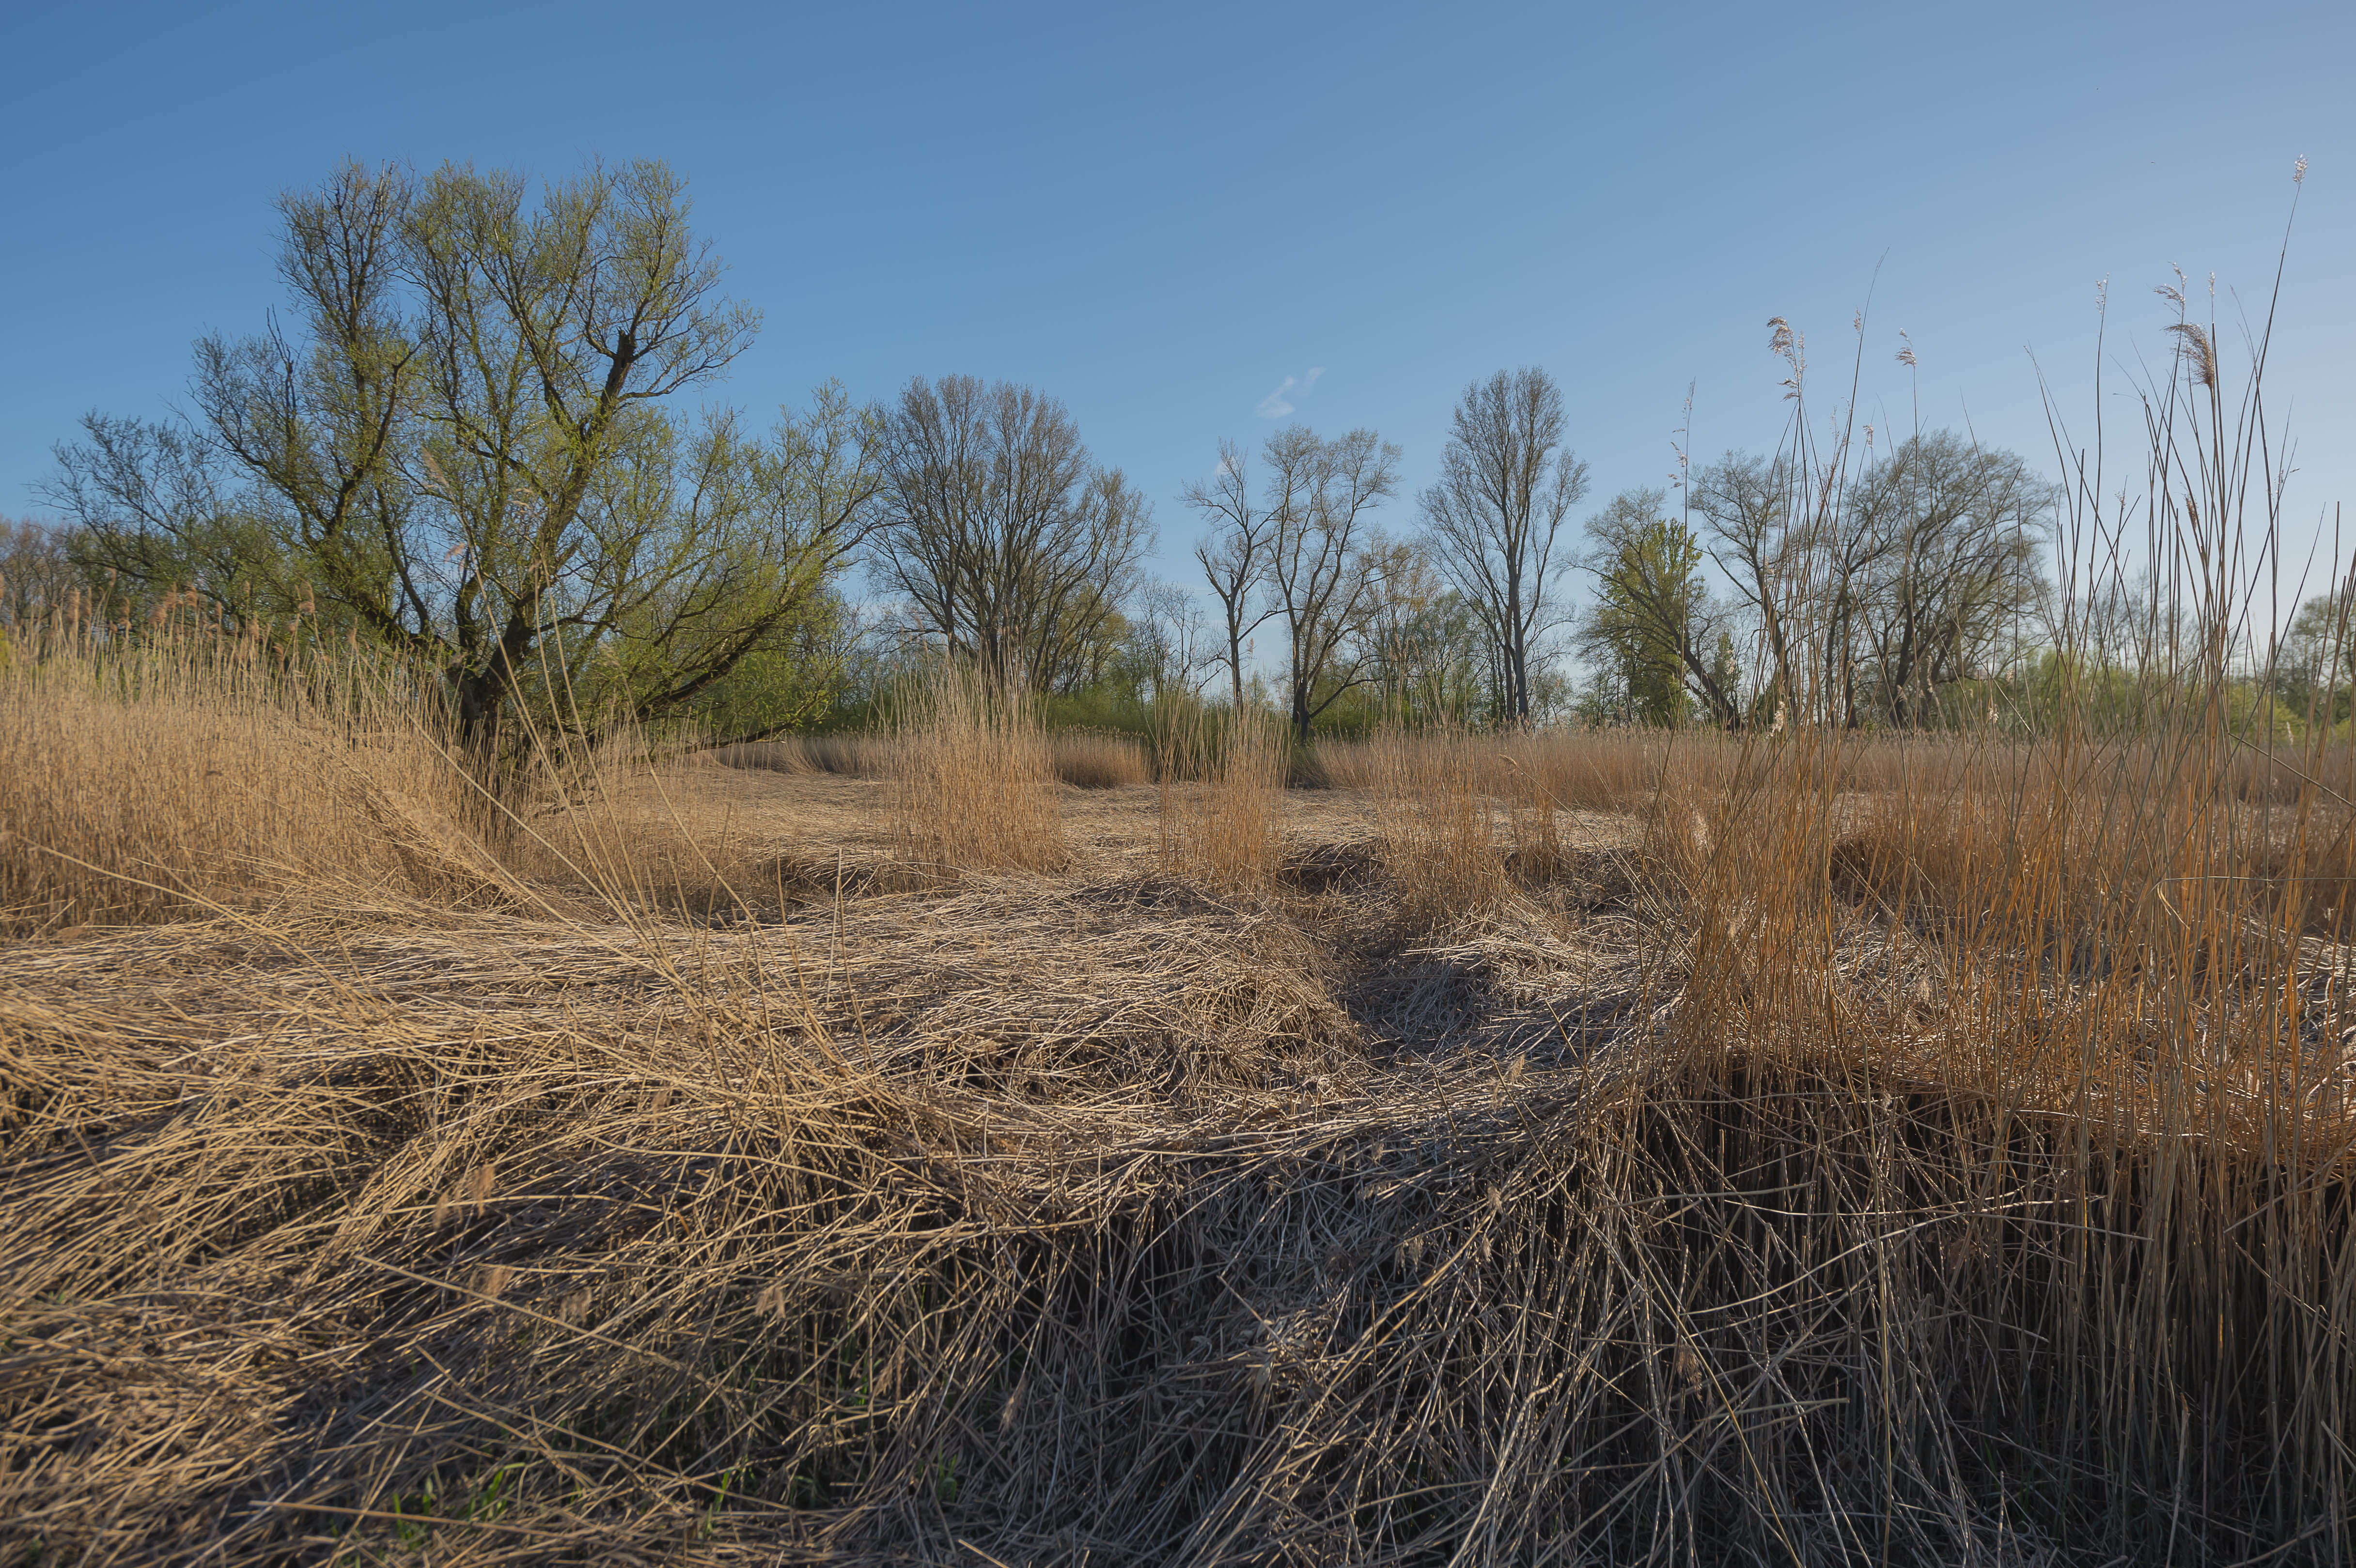 reedgras floodplain forest